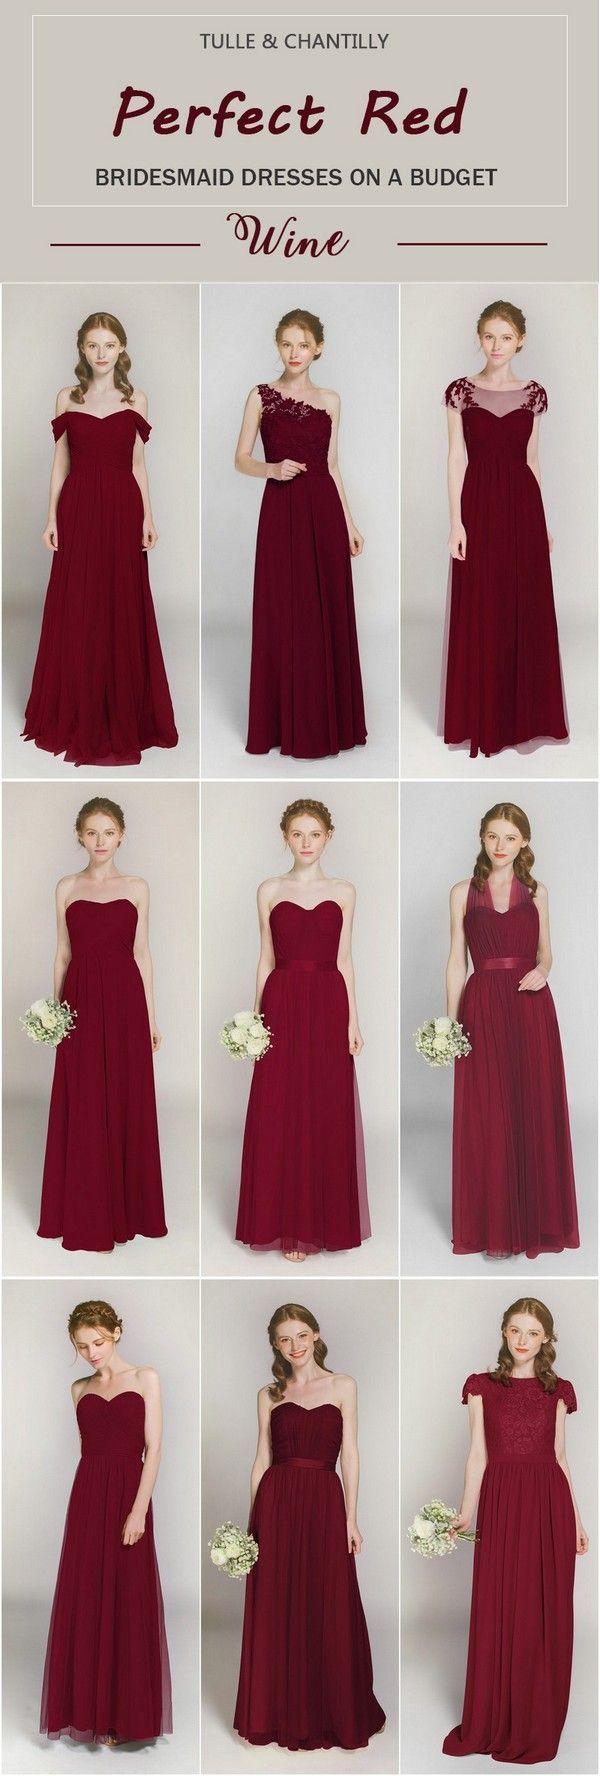 Burgundy Wine Maroon Red Bridesmaid Dresses Red Bridesmaid Dresses Wine Bridesmaid Dresses Red Bridesmaids